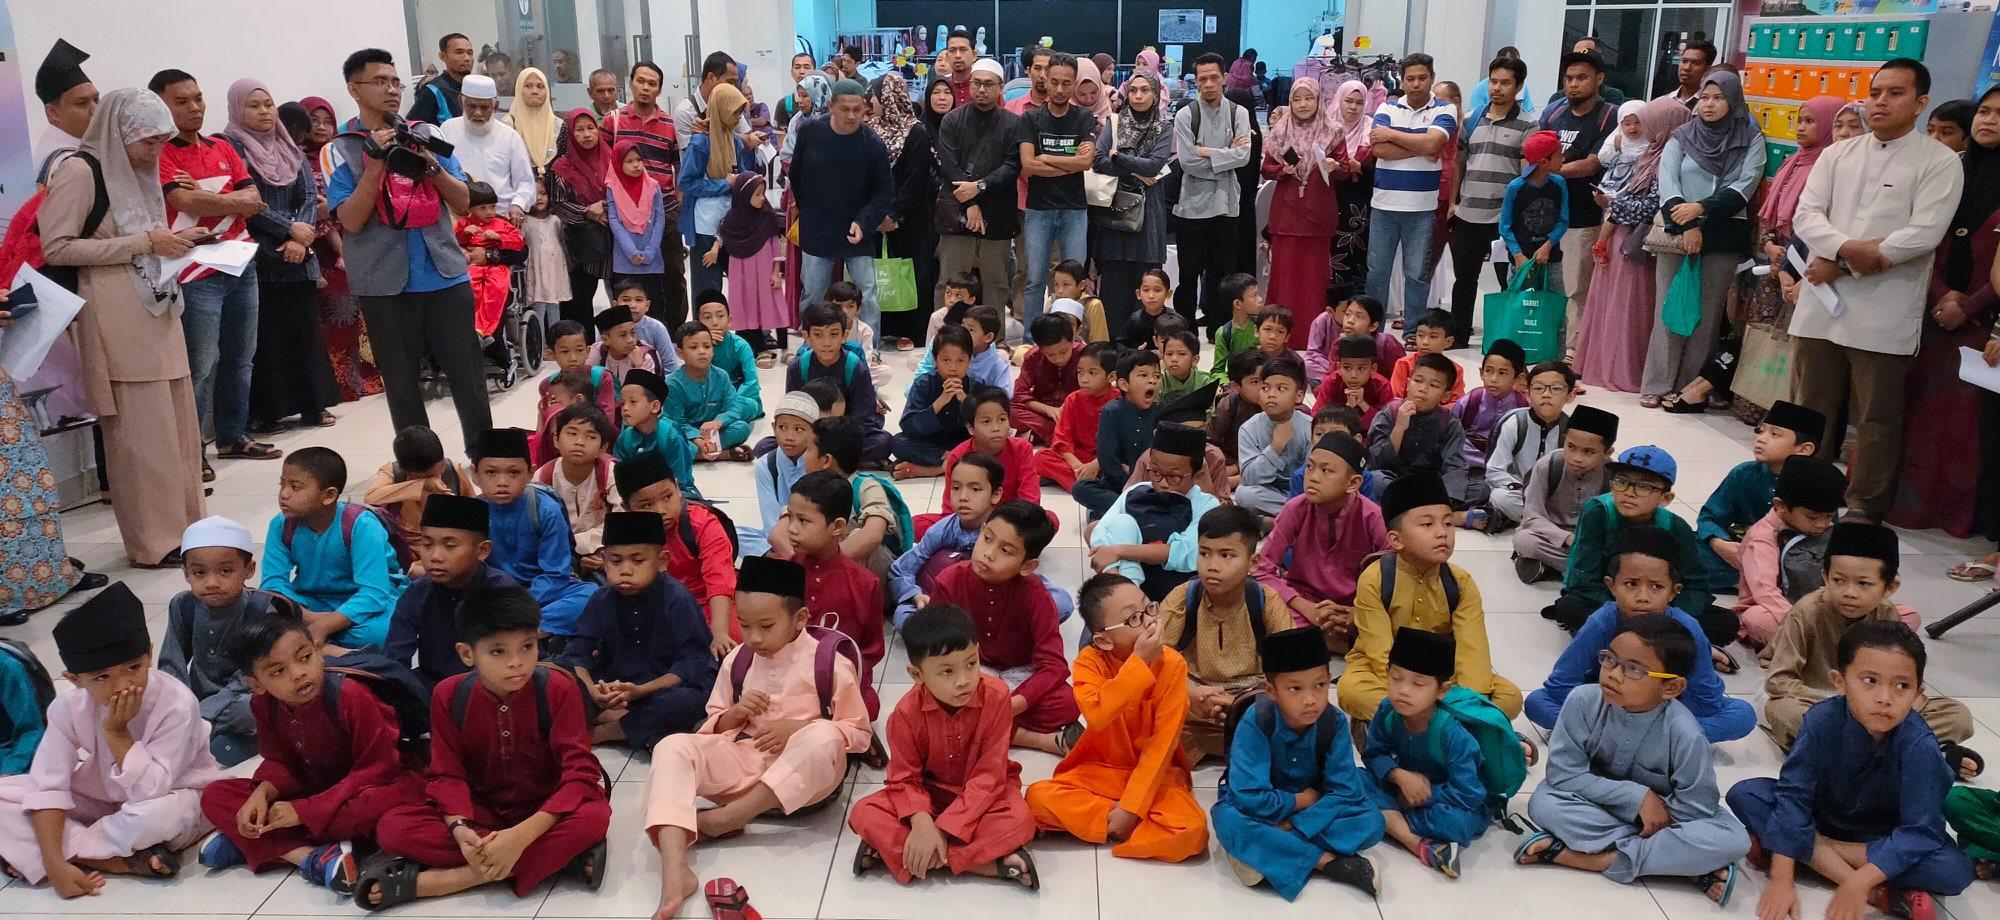 Program Khatan Perdana 2019@ Masjid Tuanku Mizan Zainal Abidin,Putrajaya.